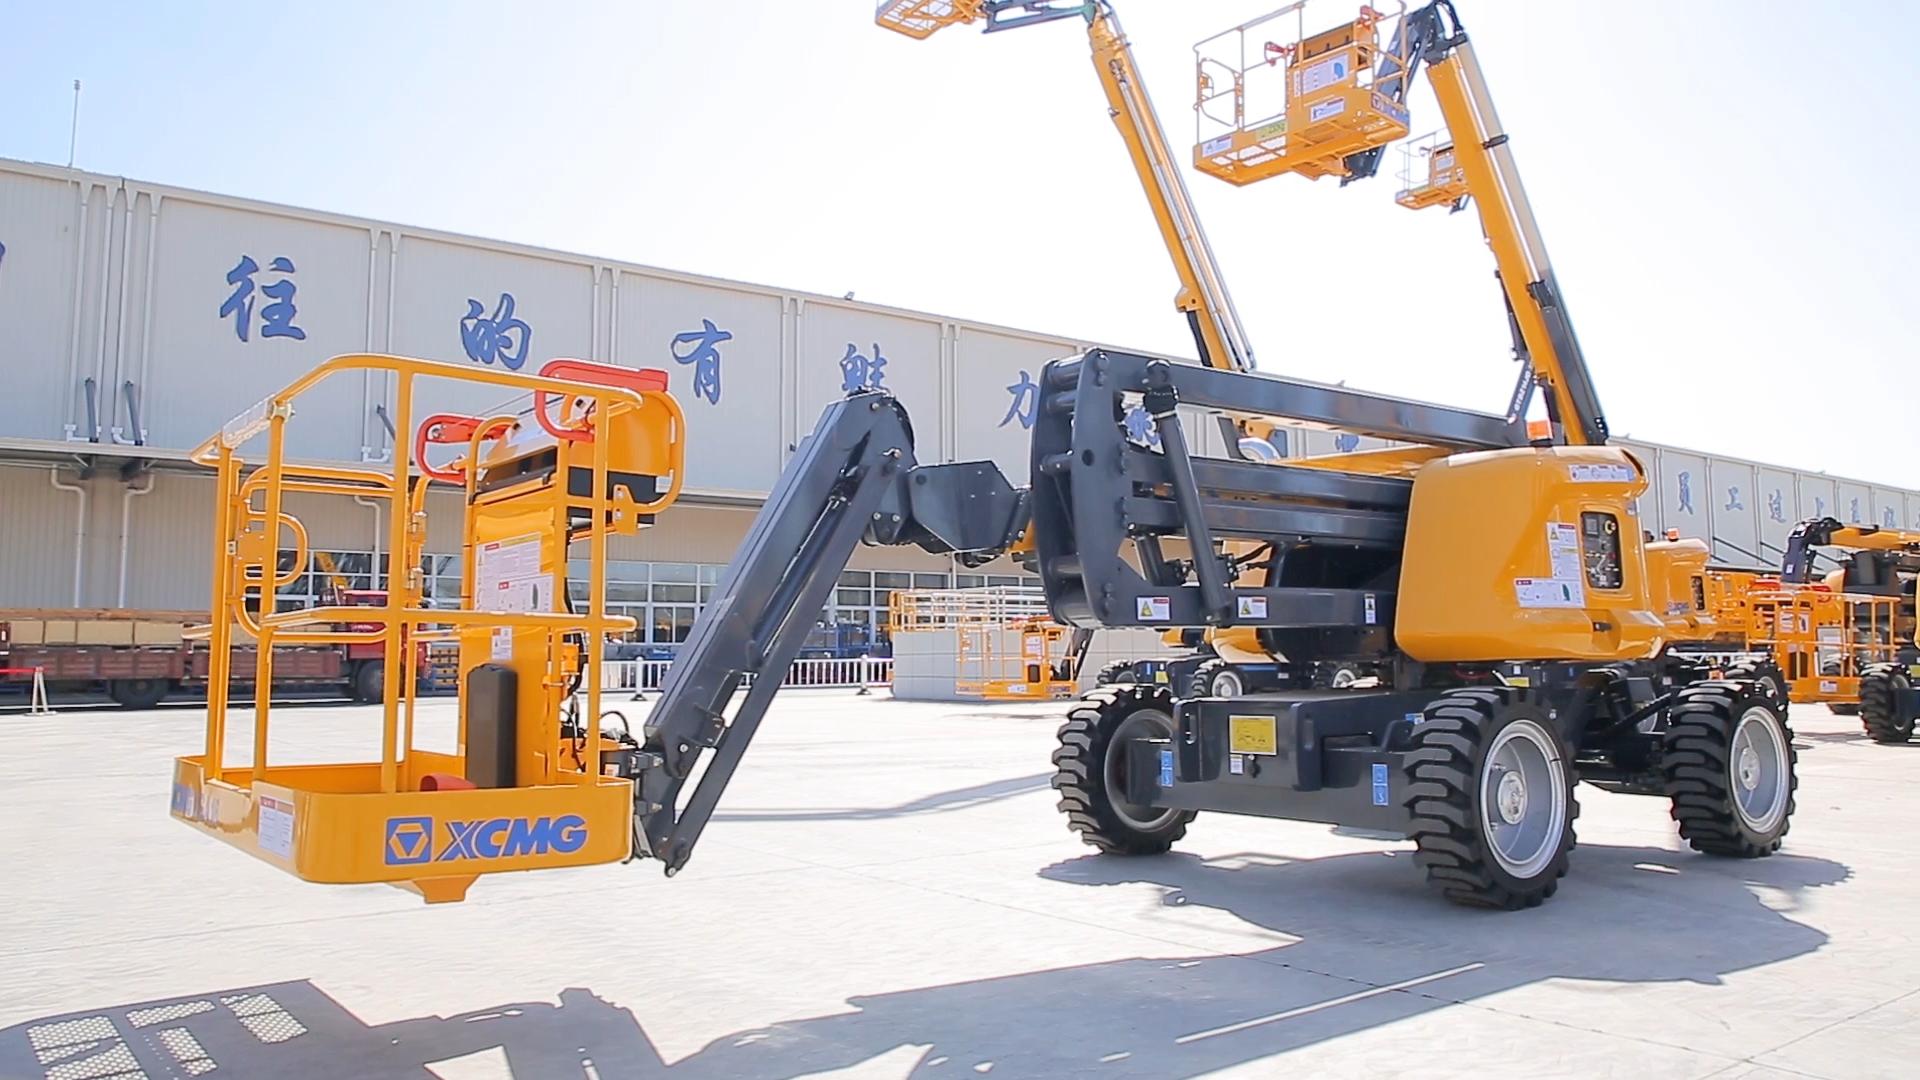 XCMG हवाई काम मंच 15 m GTBZ14JD व्यक्त manlift कीमत